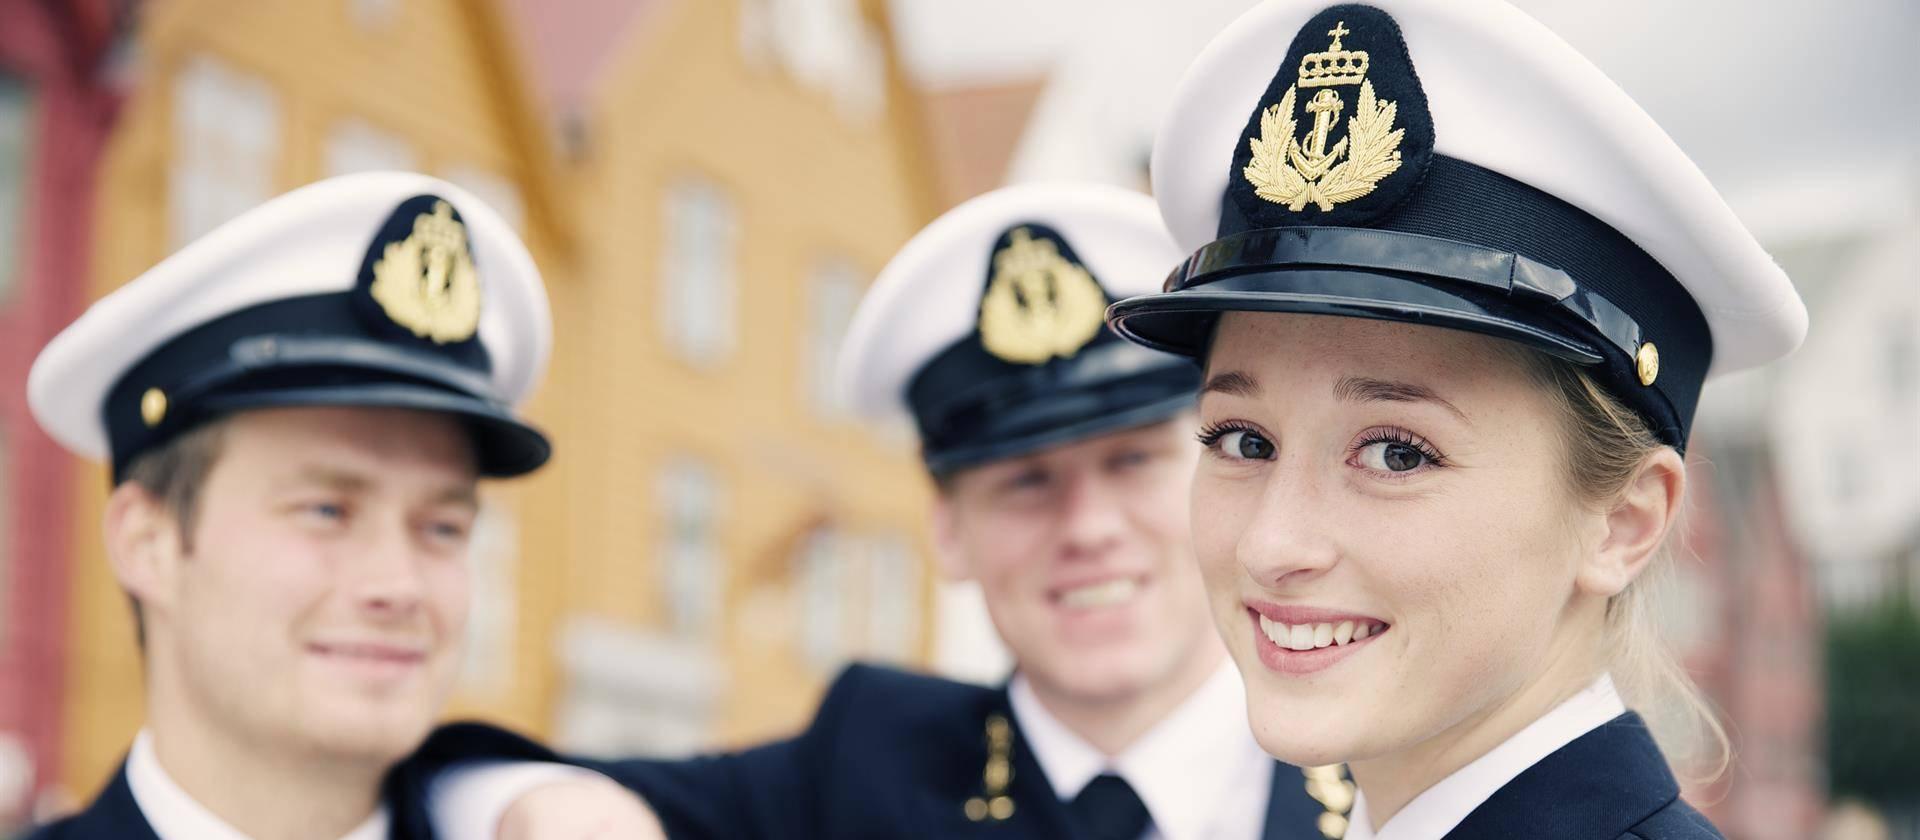 Norwegian Naval Academy (RNoNA) РLaksev̴g, Norway ...